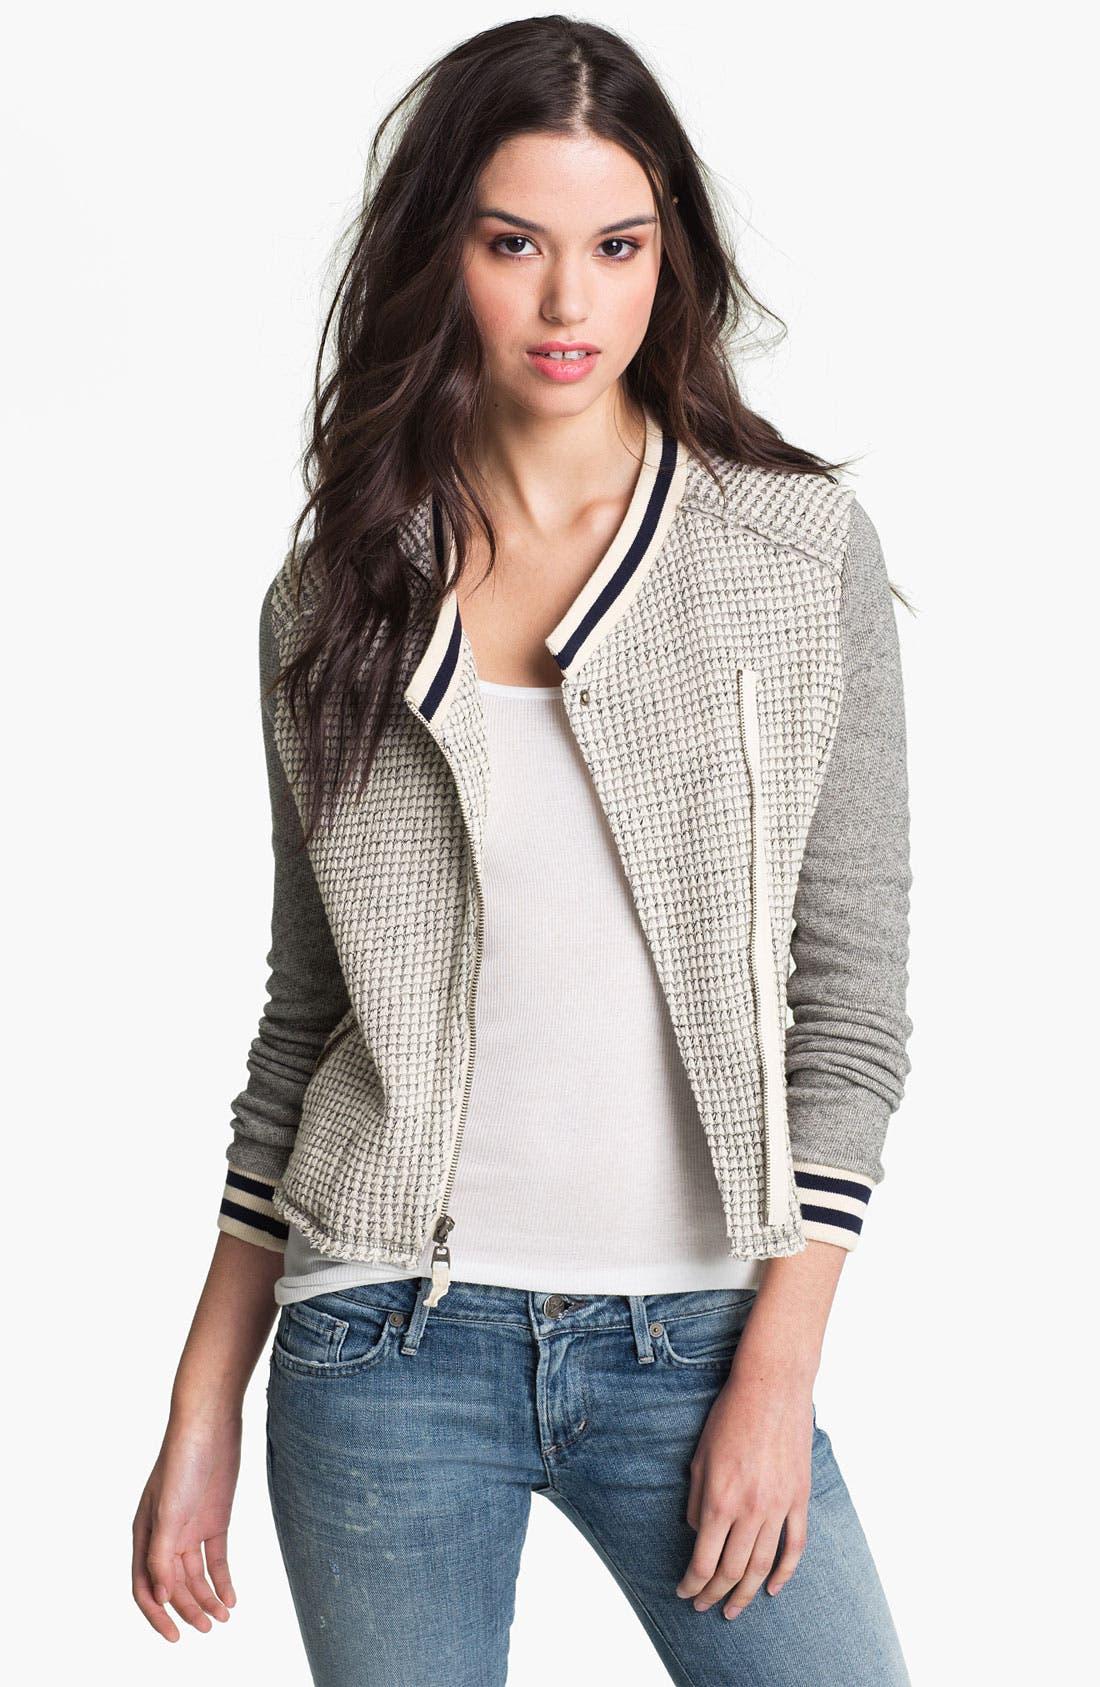 Main Image - Splendid 'Rydell' Thermal Varsity Jacket